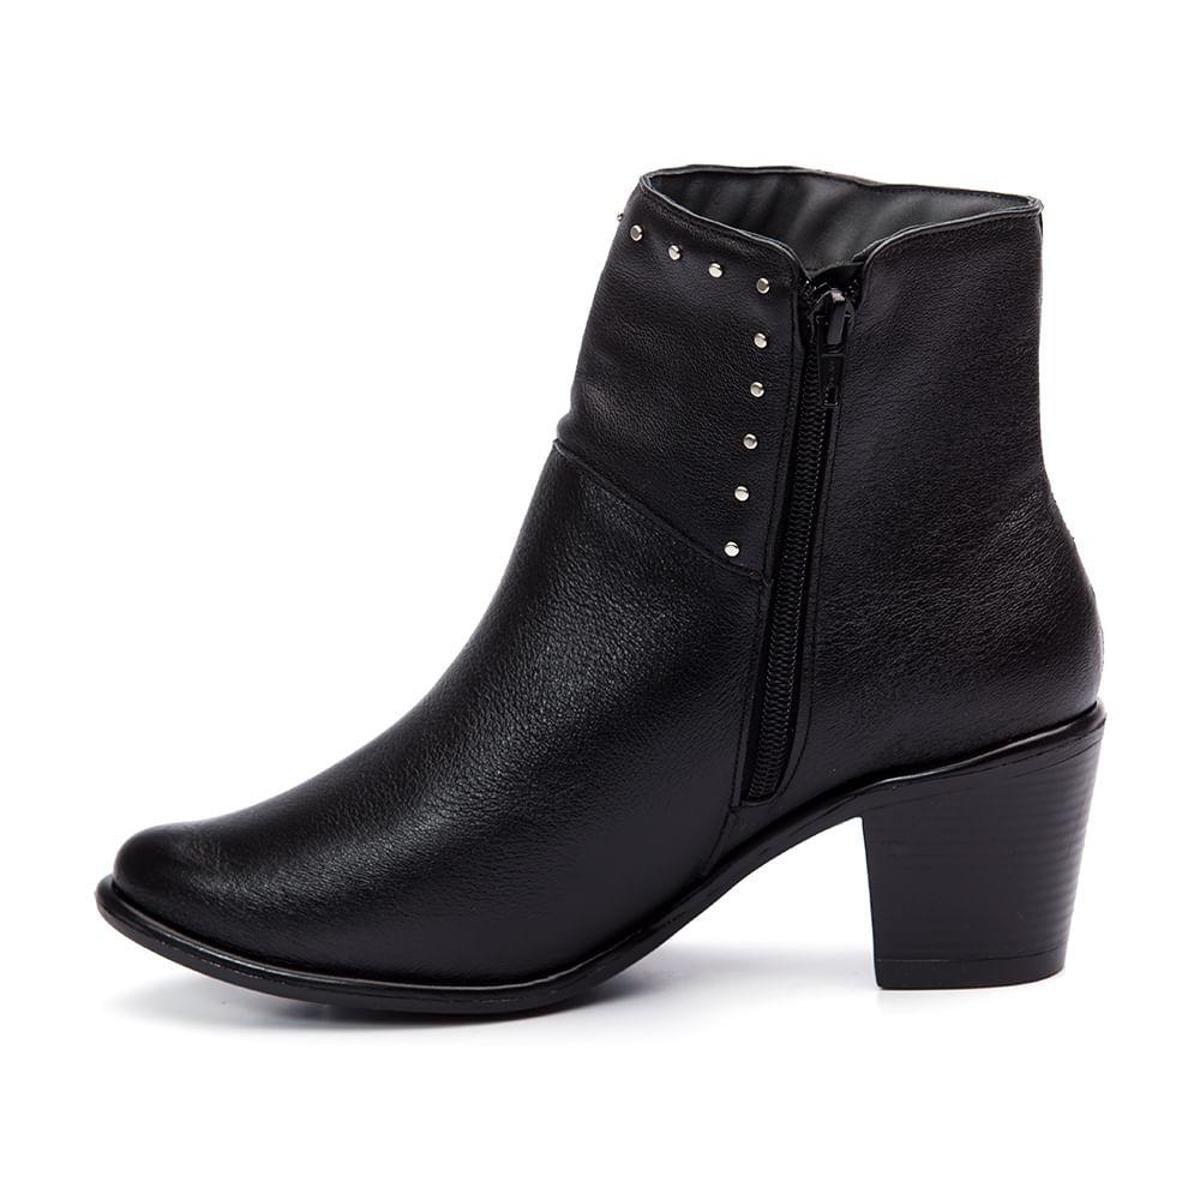 7712 Bota Couro Doctor Preto Jade 7712 Bota Jade Feminina Doctor Couro Shoes n7qFxwYqWS